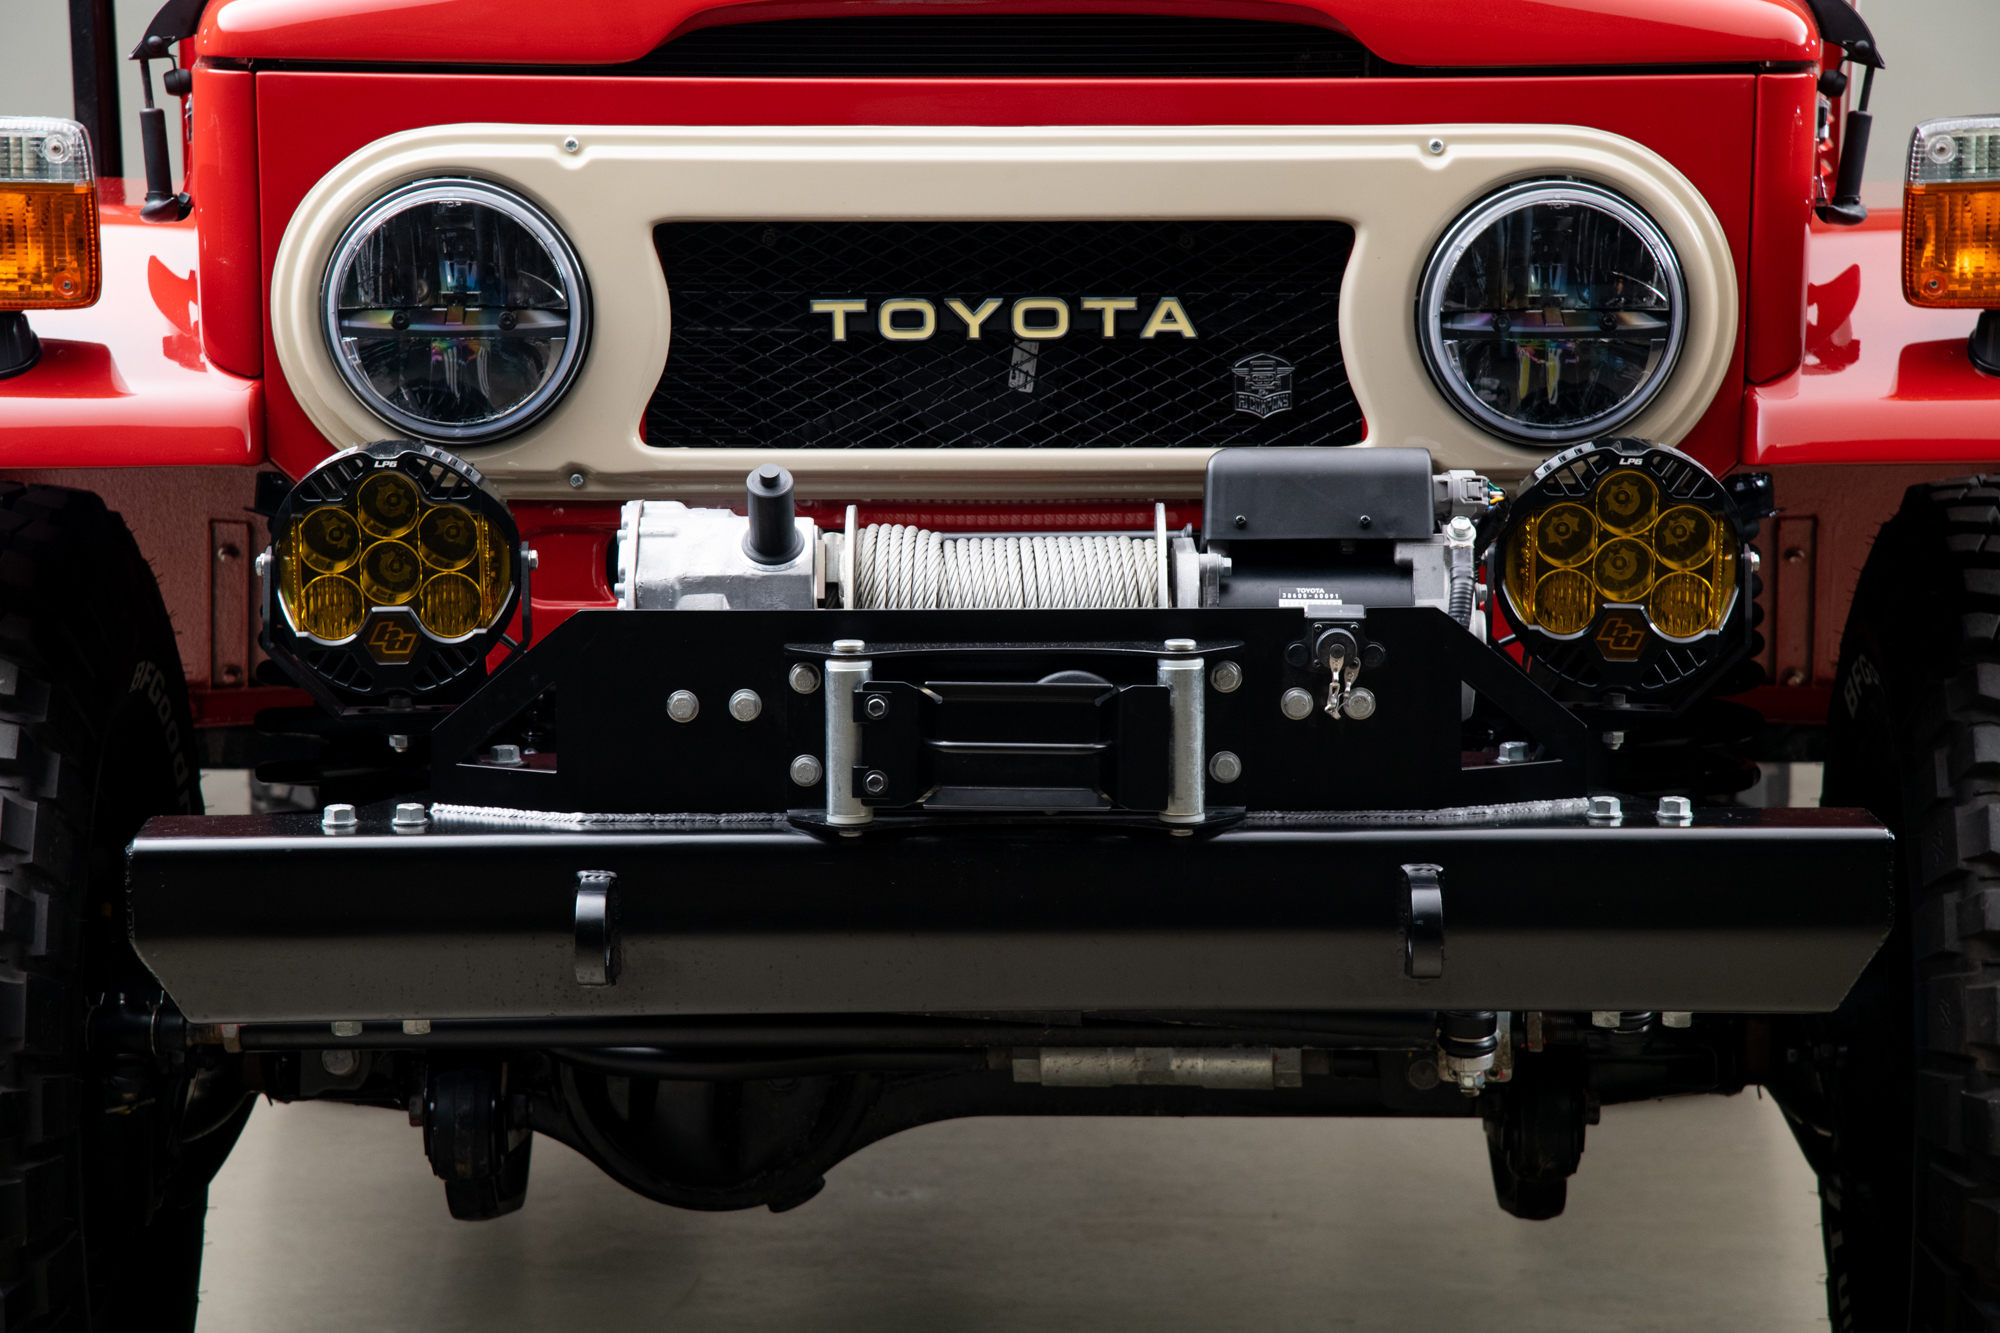 1976 Toyota FJ43 Land Cruiser , FREEBORN RED, VIN FJ43-42370, MILEAGE 1471